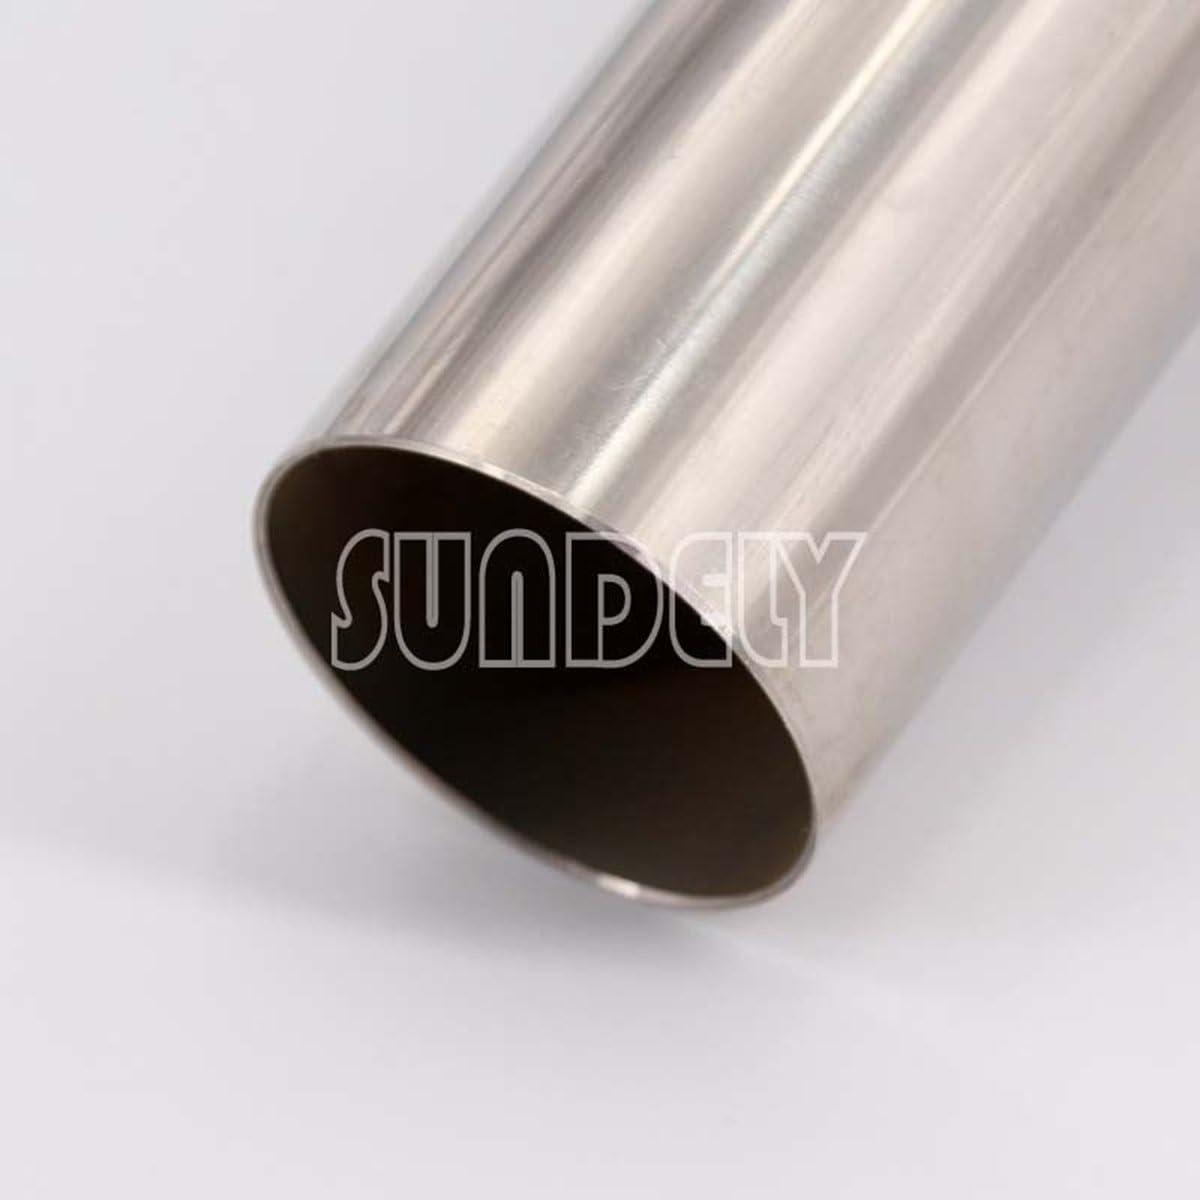 SUNDELY/® 4.5 Universal Round Tip Exhaust Muffler insert Removable Silencer Stainless